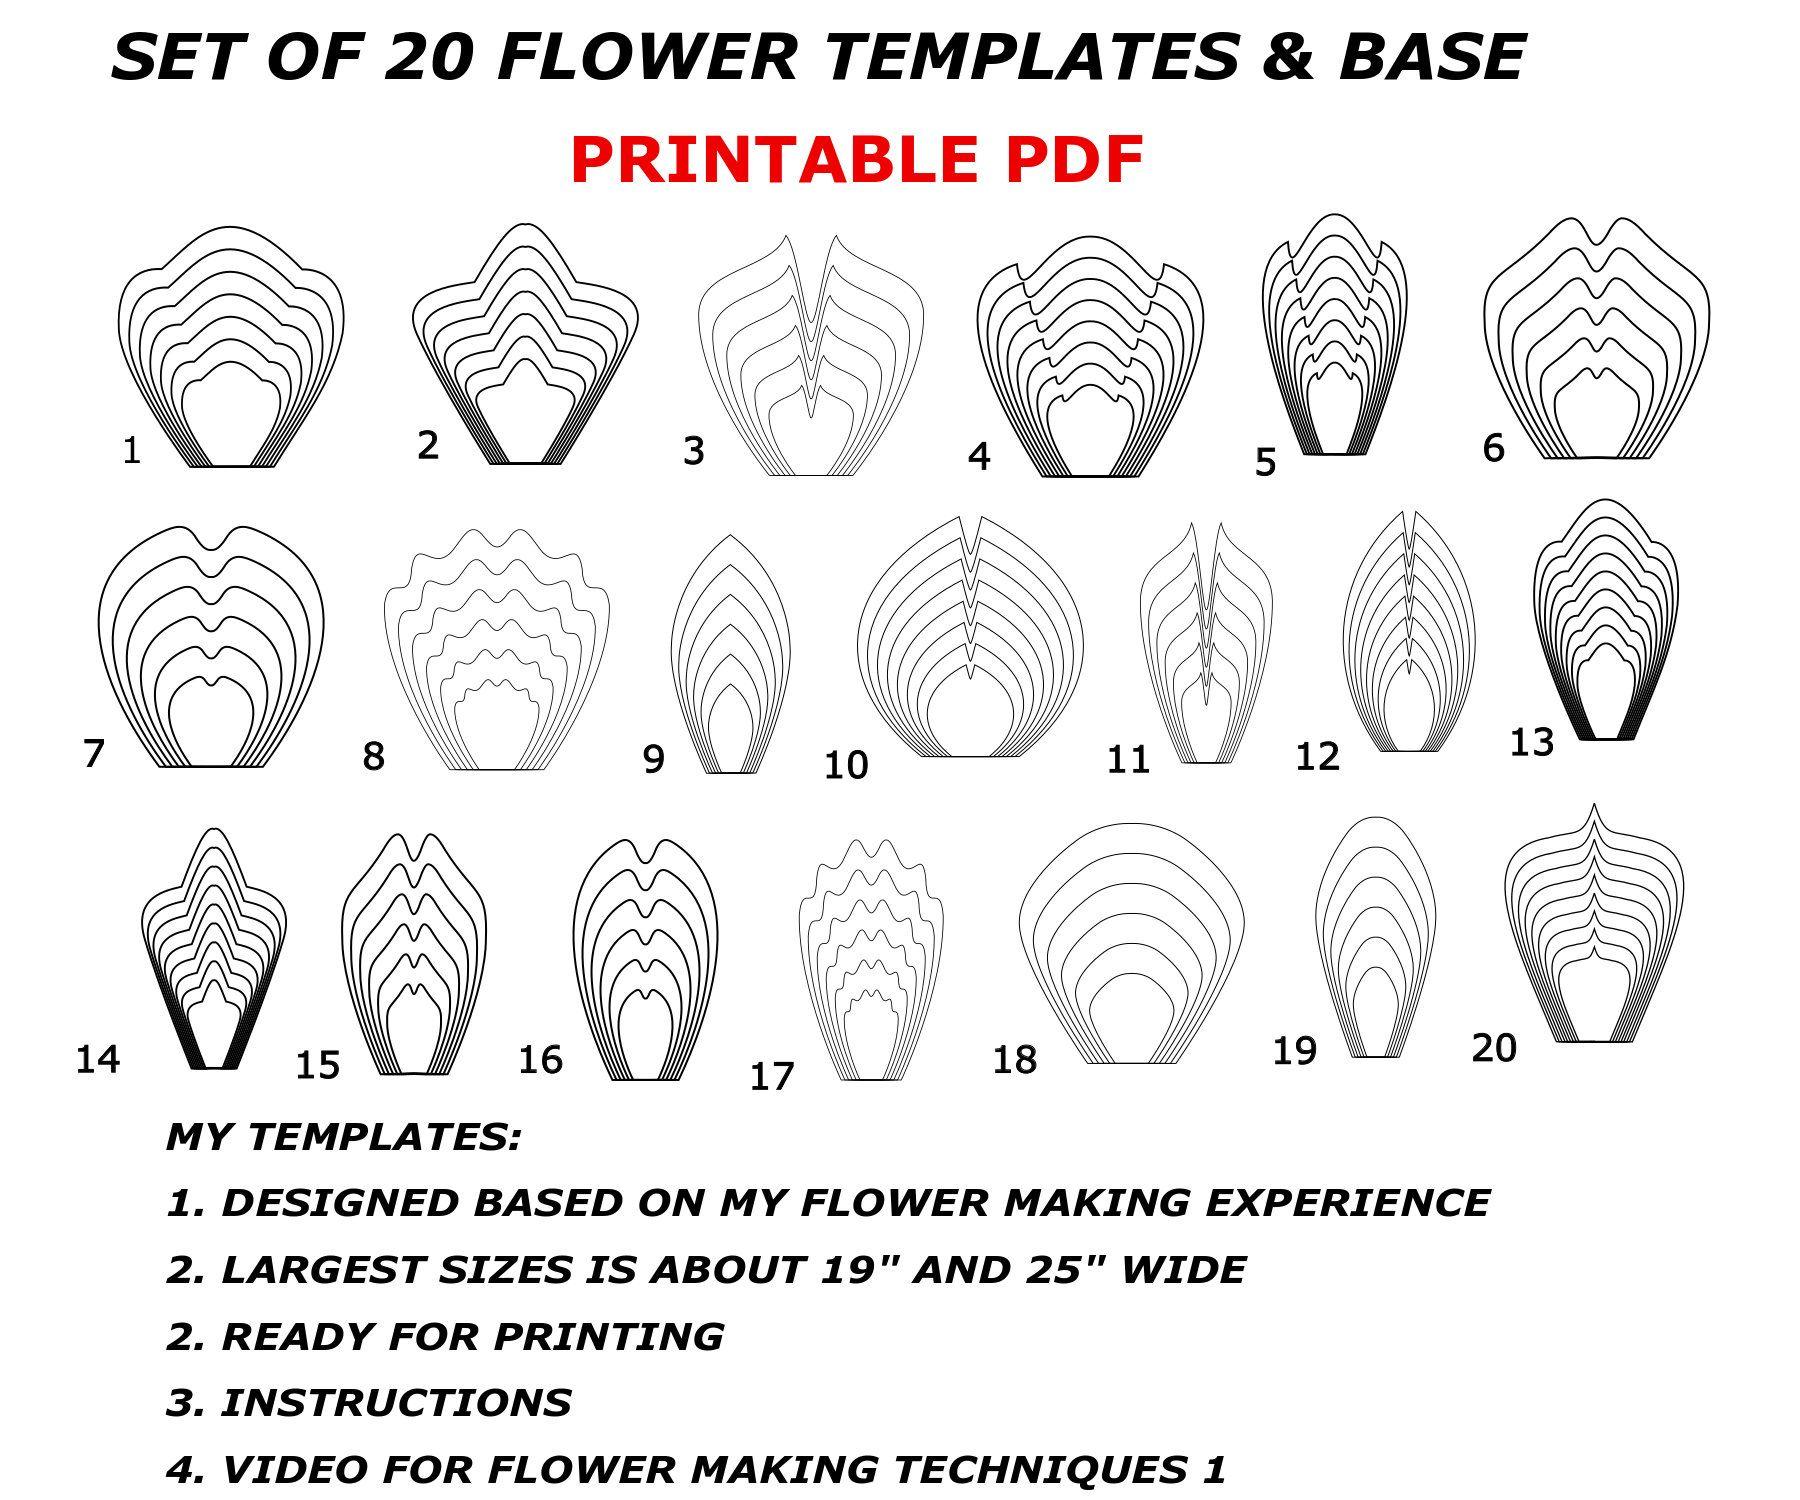 Printable Flower Template Bundles, Paper Flower Templates